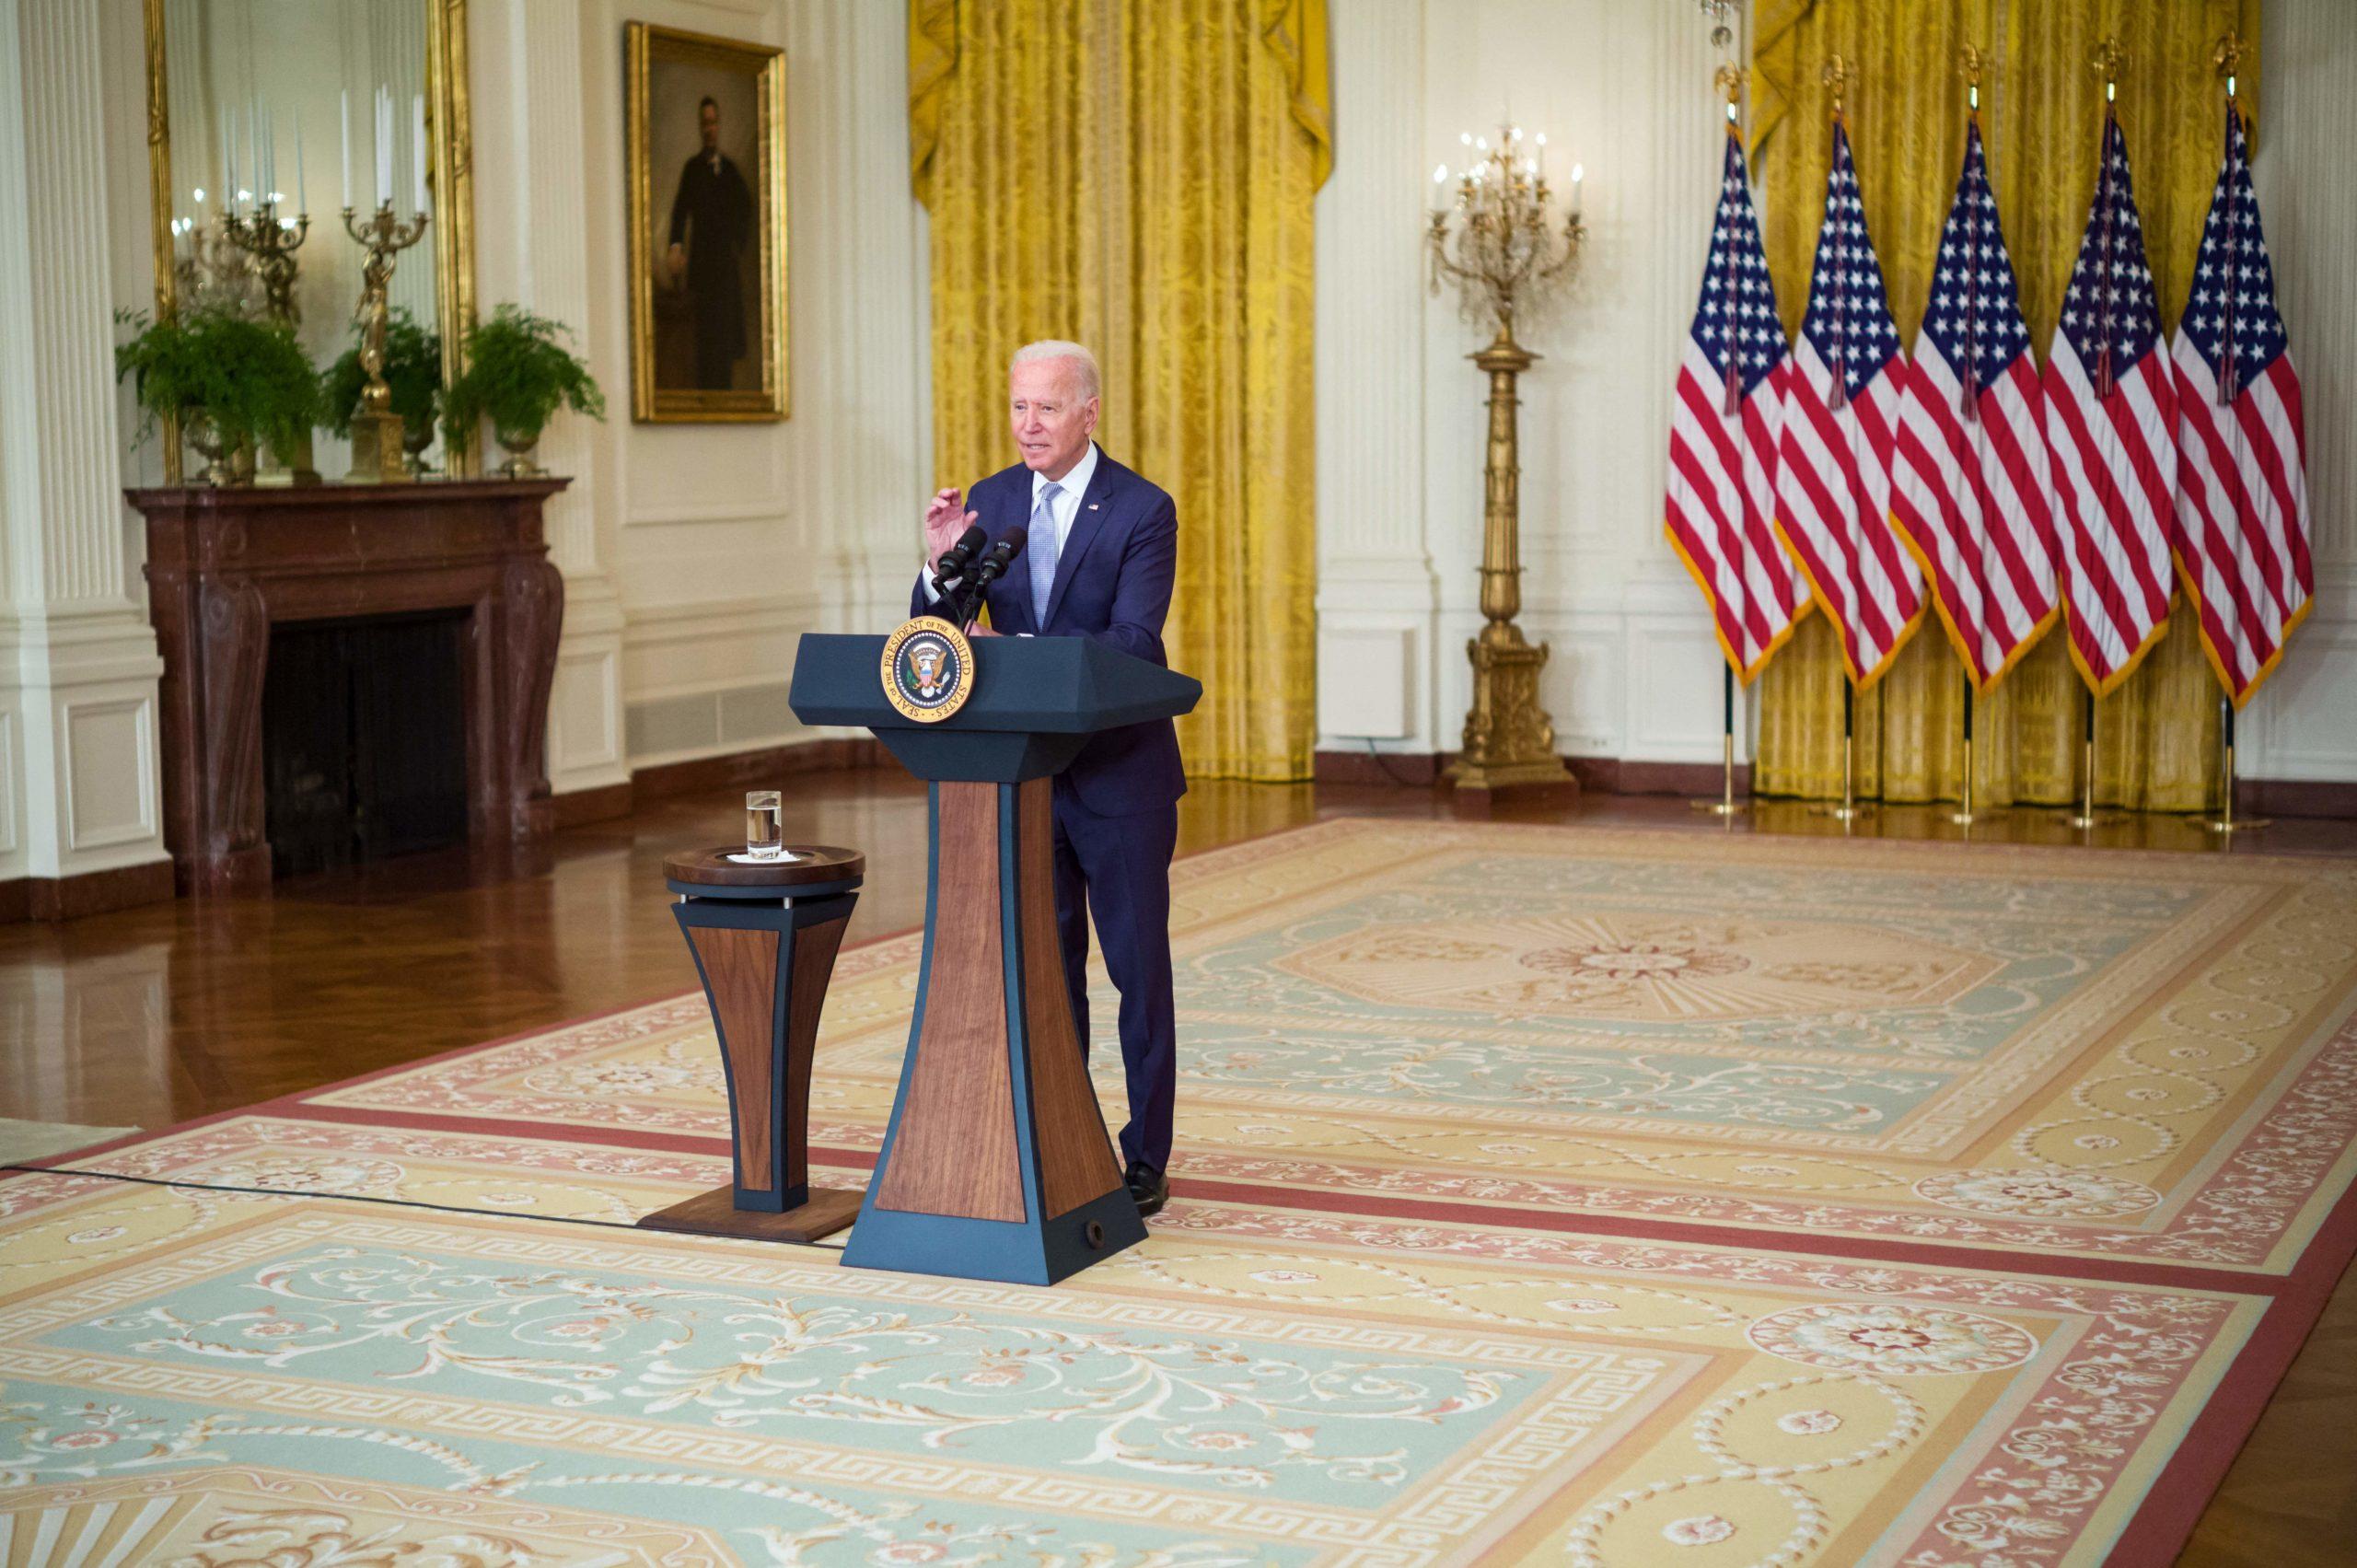 President Joe Biden speaks about his Build Back Better agenda on Aug. 12. (Mandel Ngan/AFP via Getty Images)